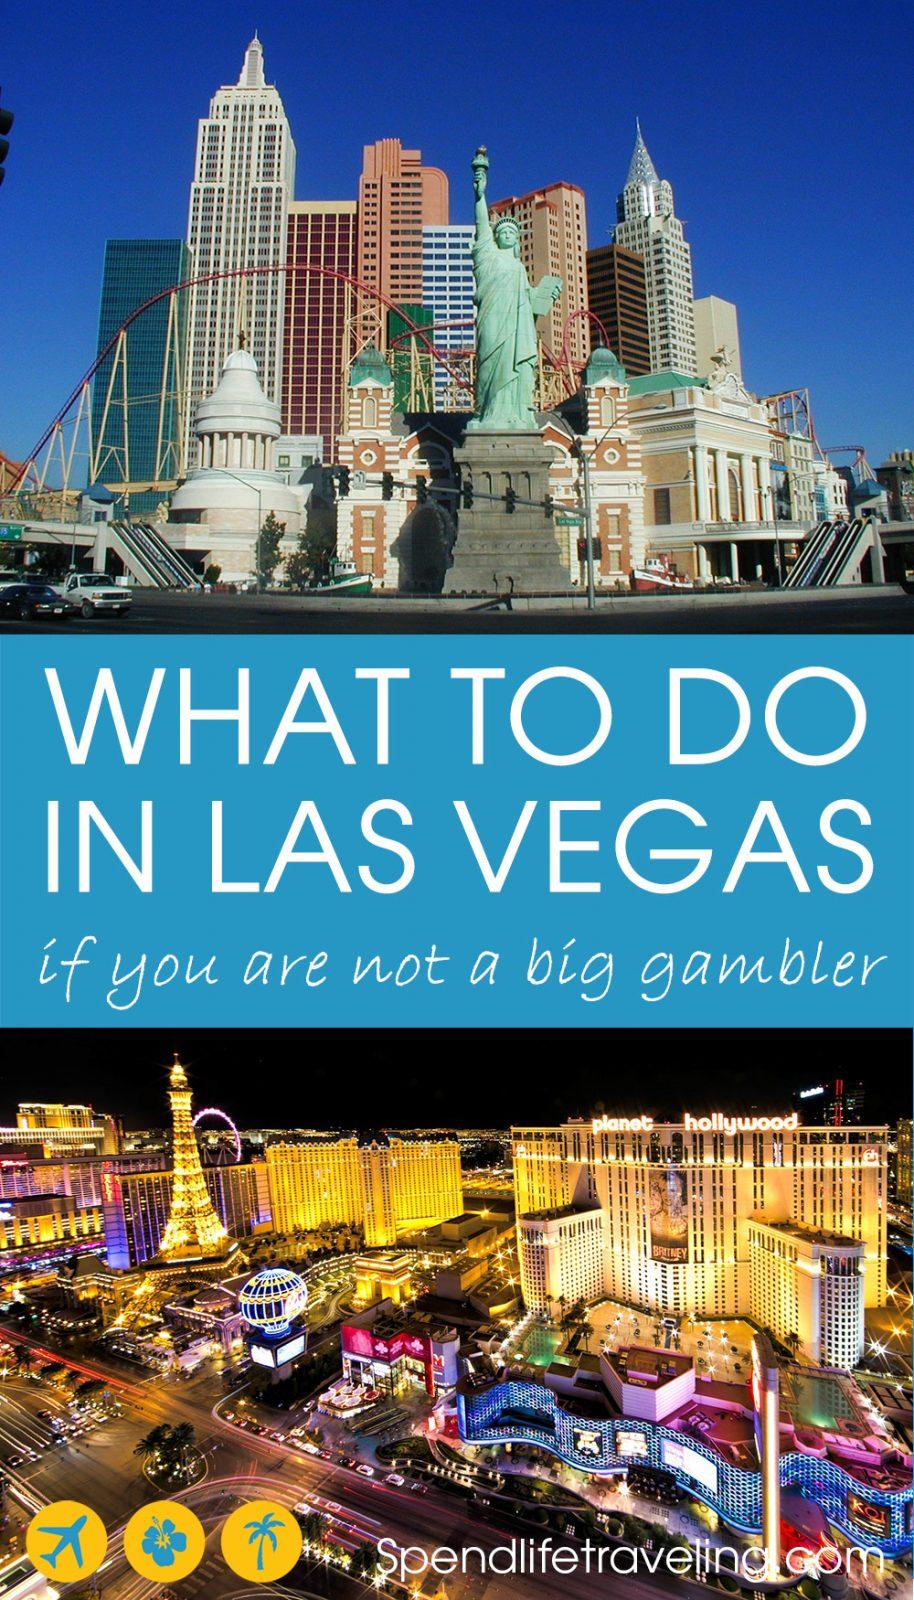 What to do in Las Vegas when you are not a big gambler? A complete guide. #LasVegas #visitLasVegas